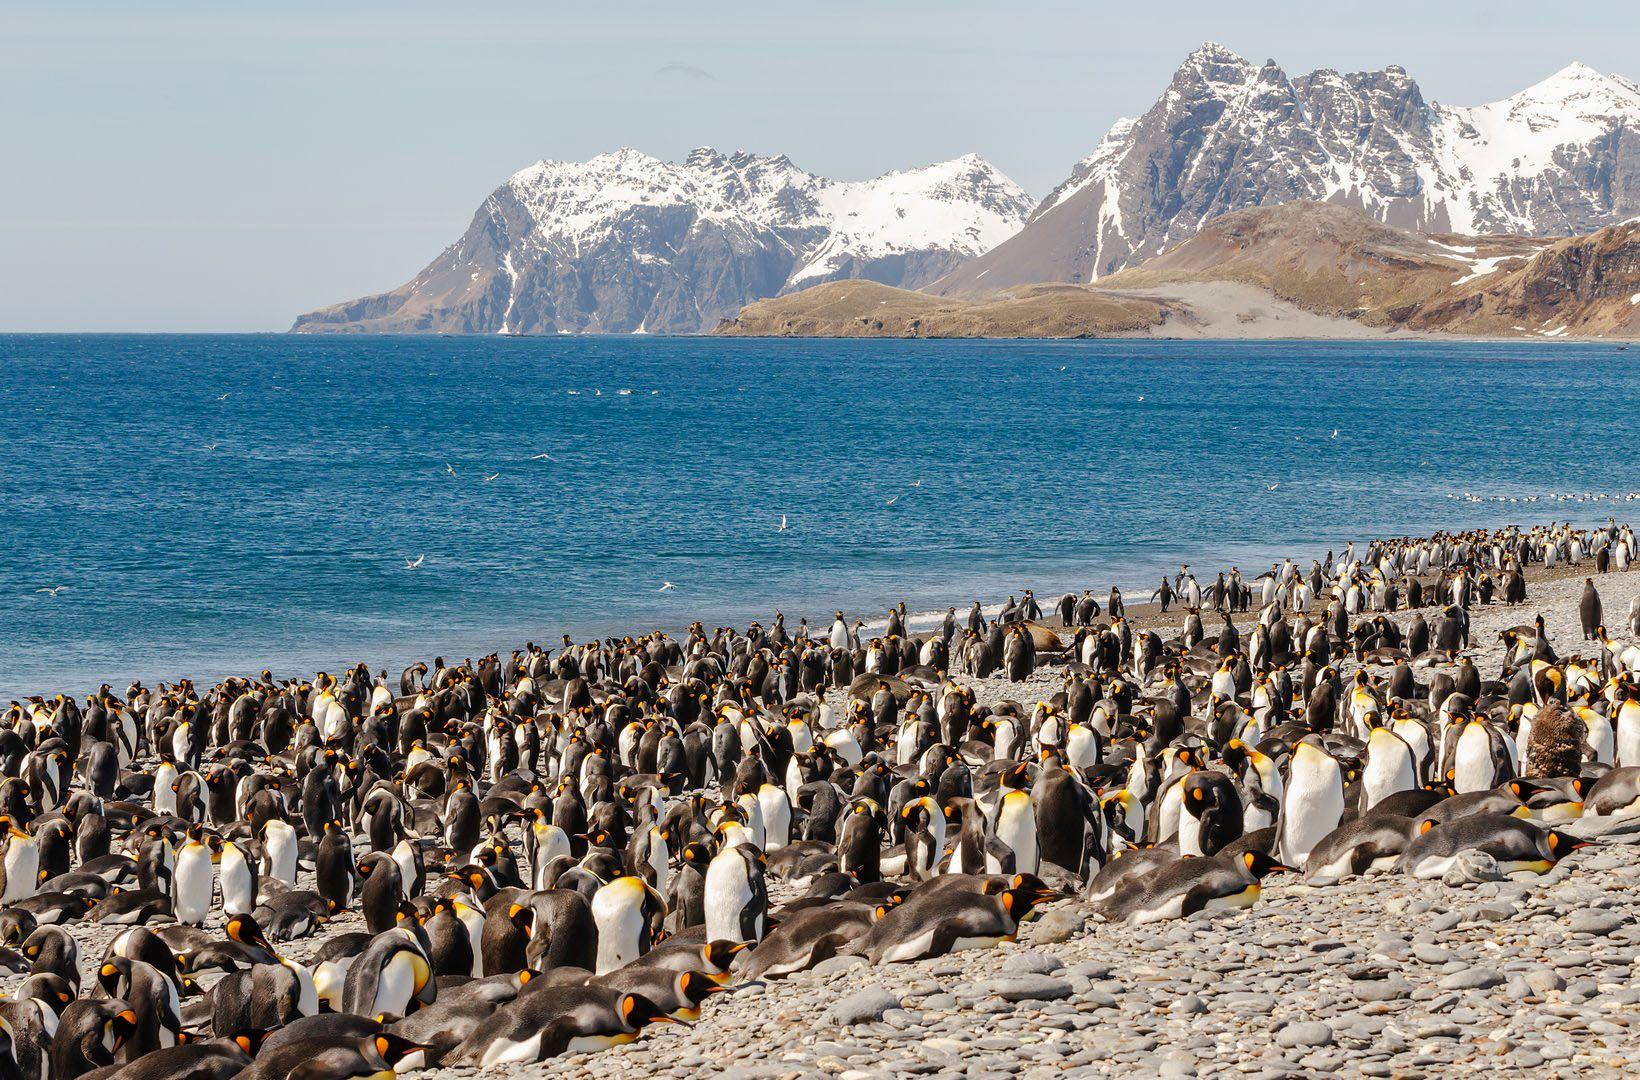 King Penguin, South Georgia, Королевский пингвин, Южная Георгия, Роман Мурушкин